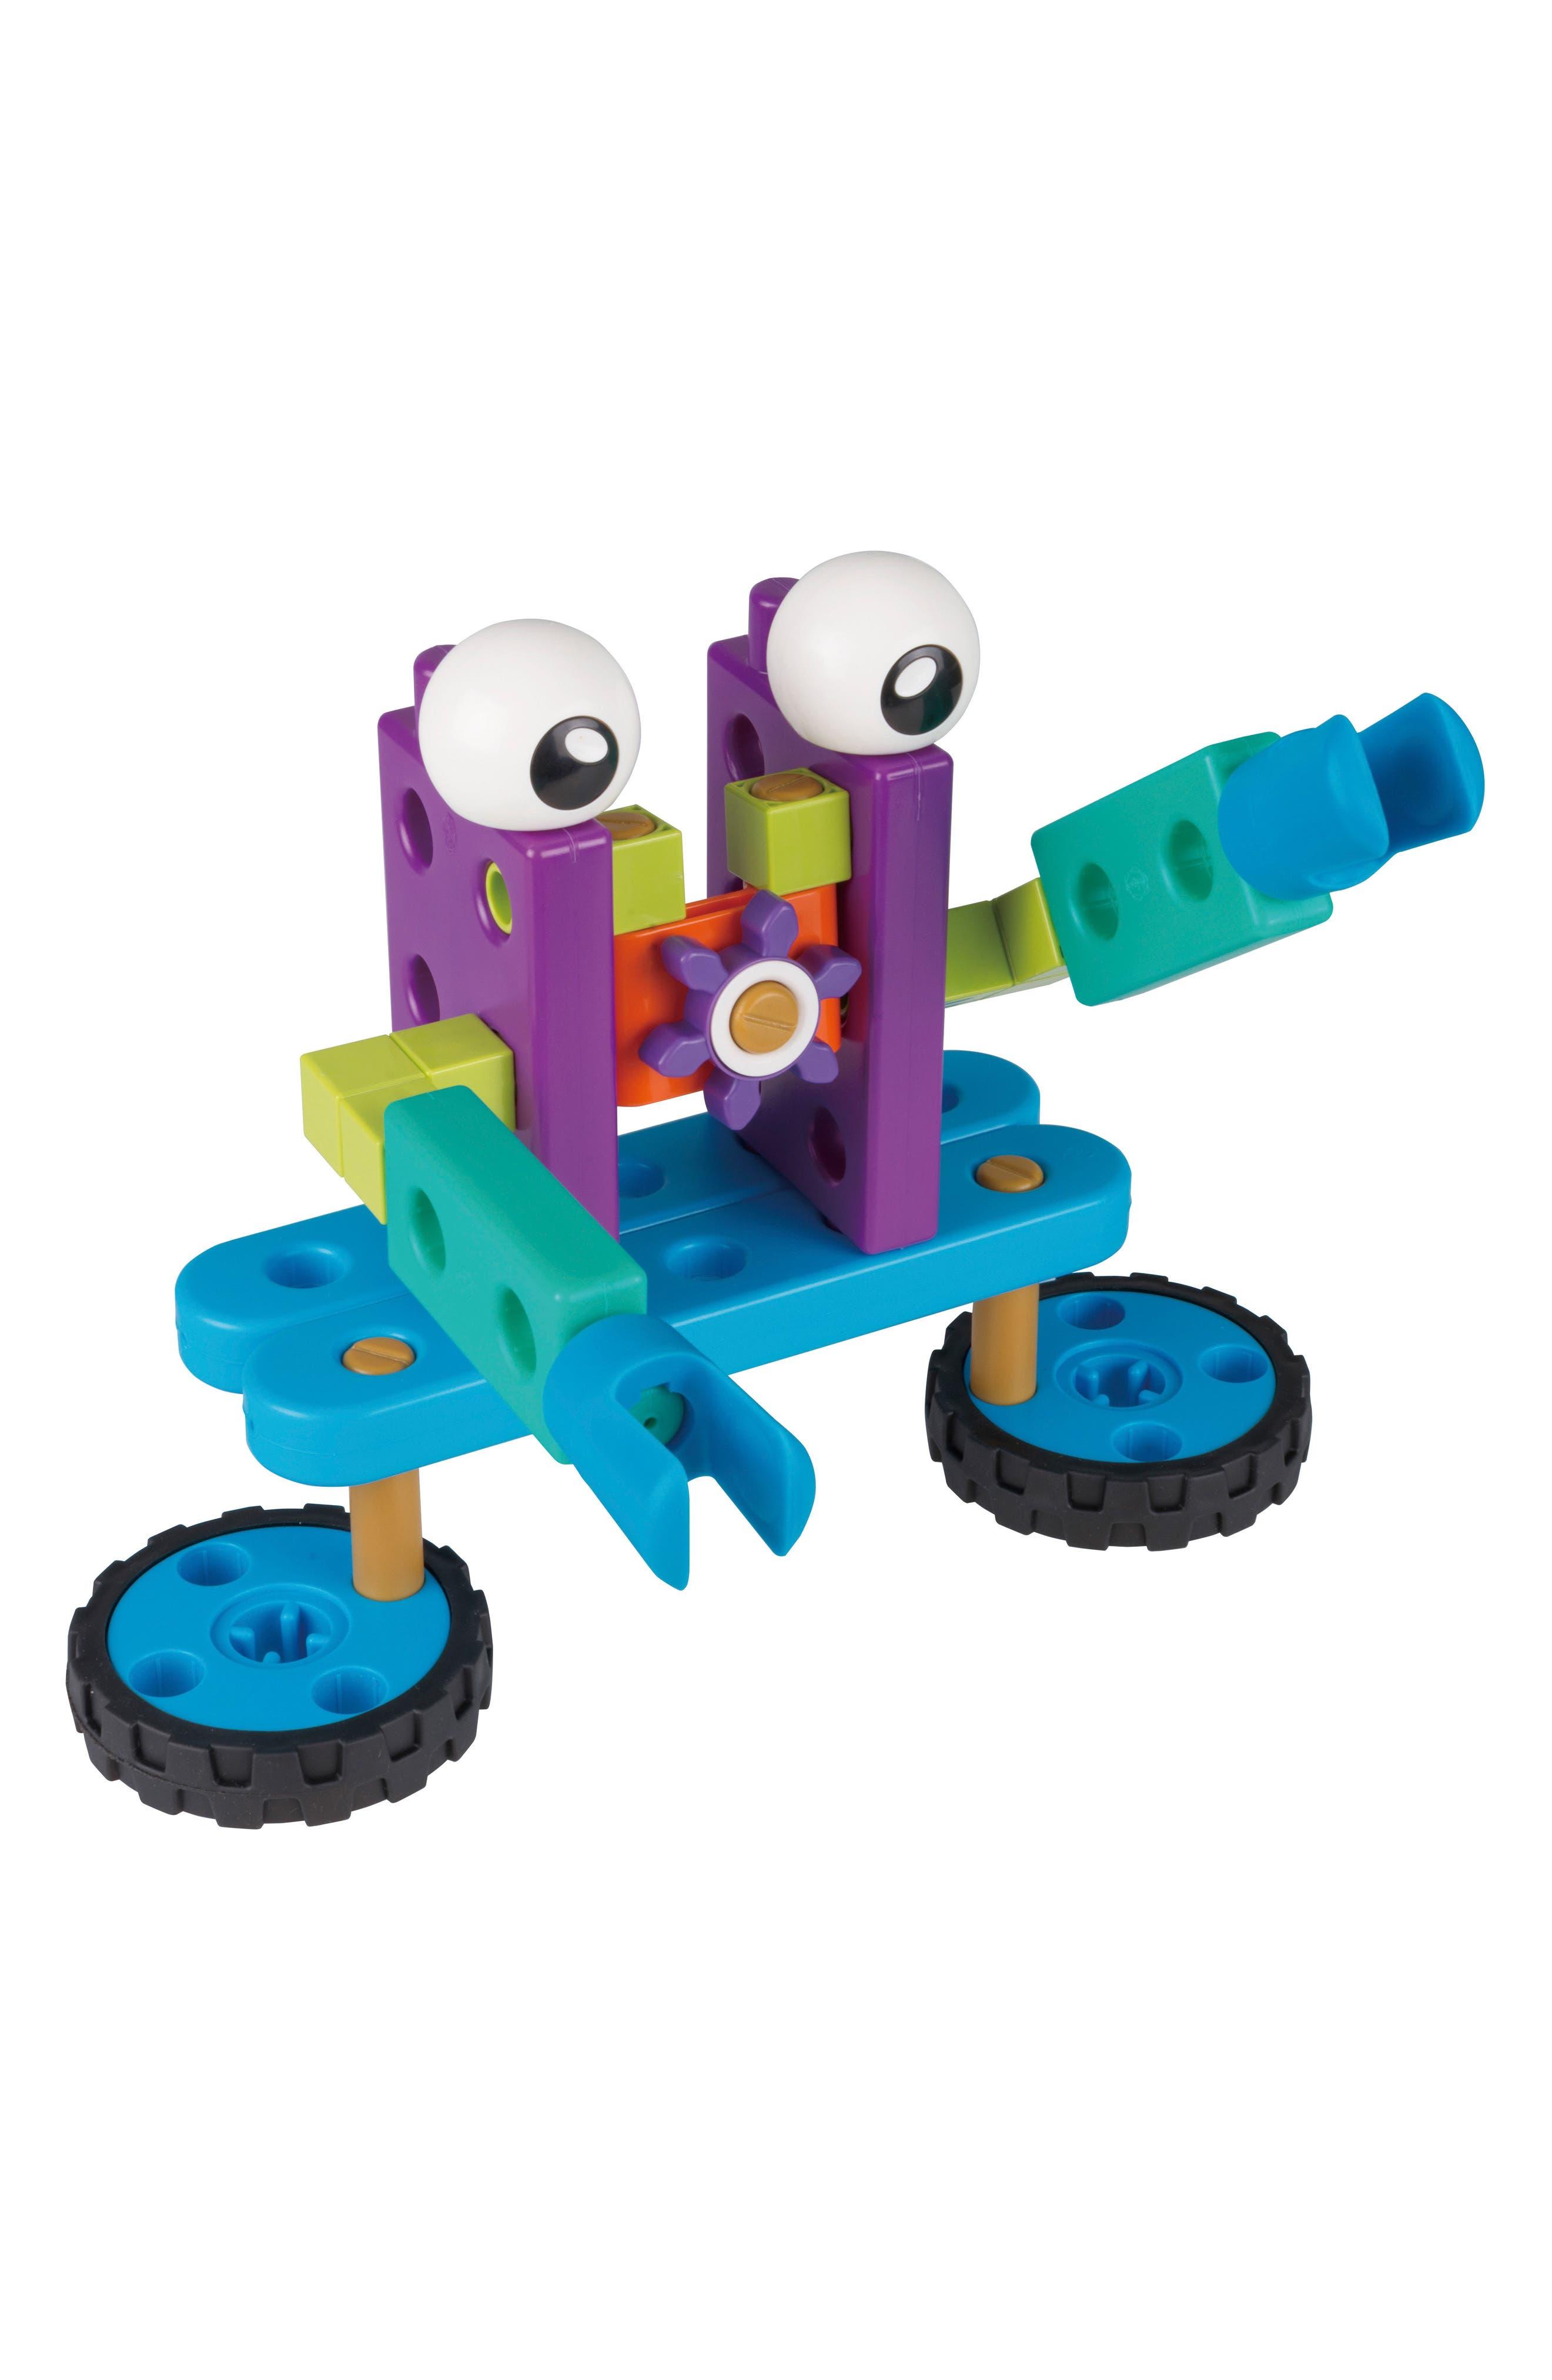 Robot Engineer Building Set & Storybook,                             Alternate thumbnail 8, color,                             Blue